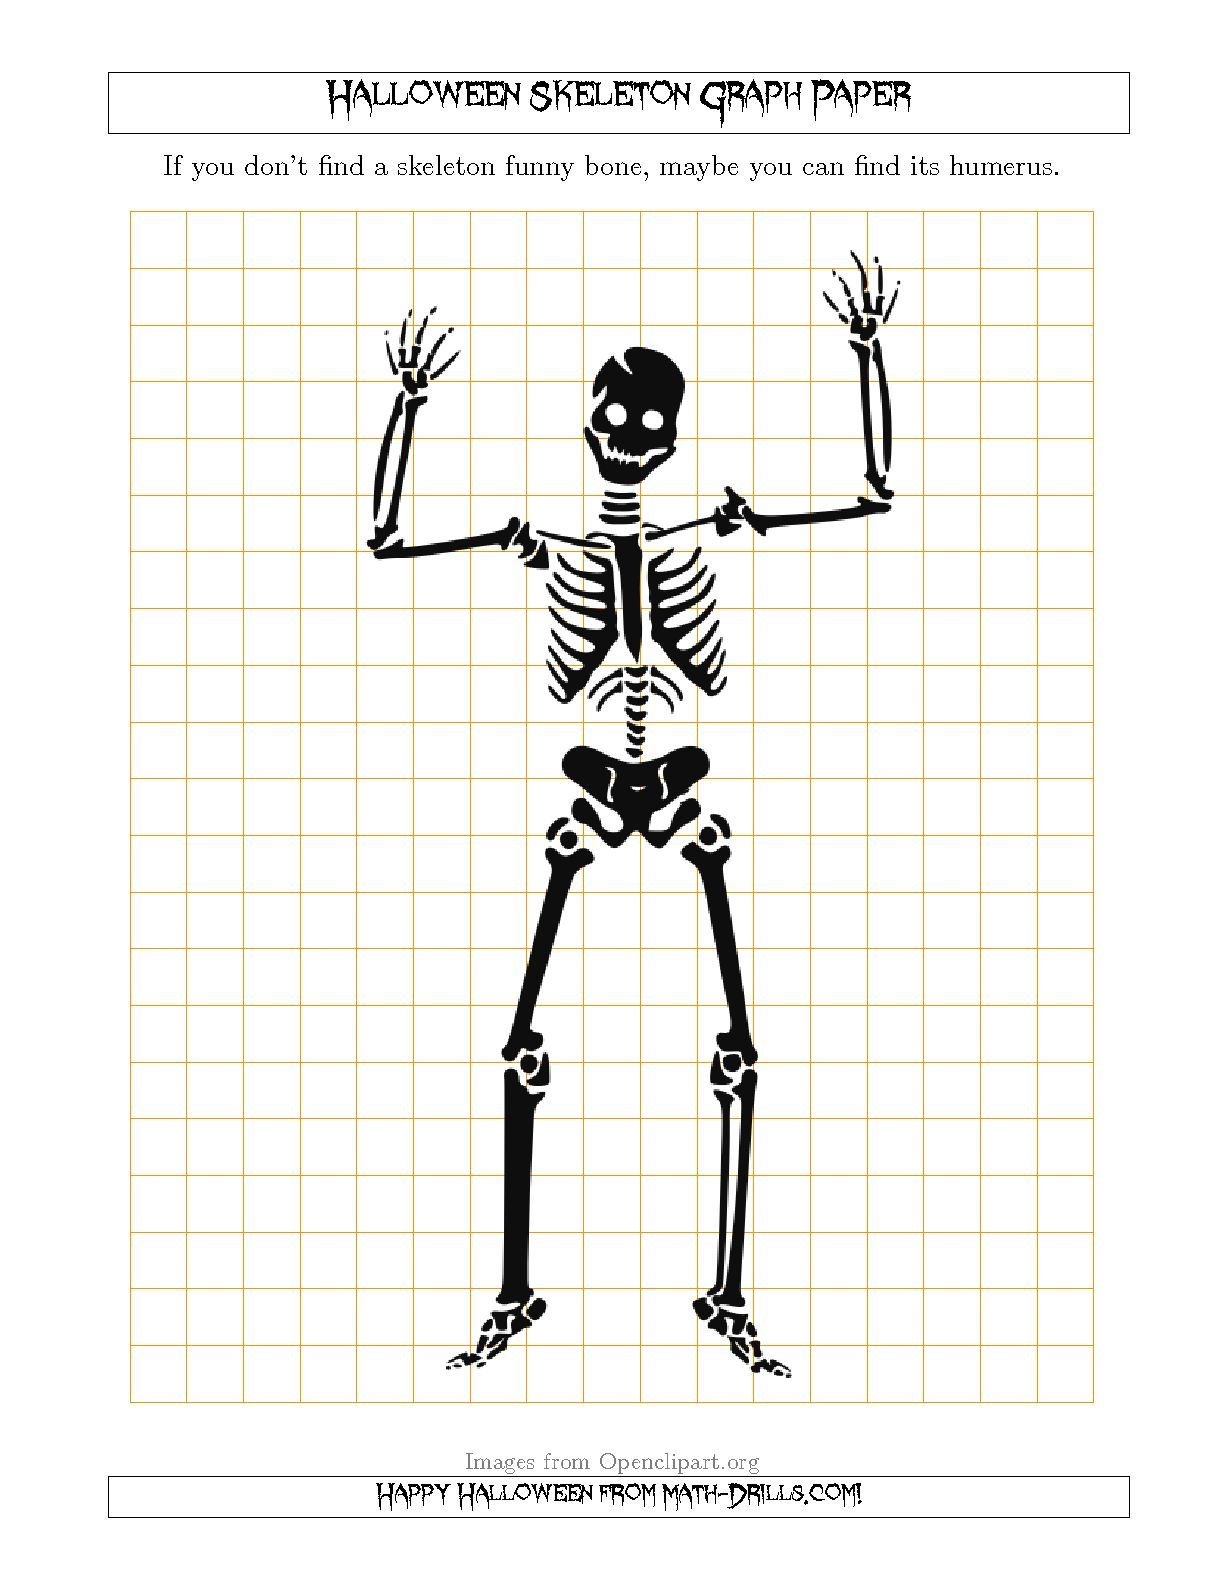 The Halloween Skeleton 1 Cm Graph Paper Halloween Skeletons Halloween Math Worksheets Graph Paper [ 1584 x 1224 Pixel ]